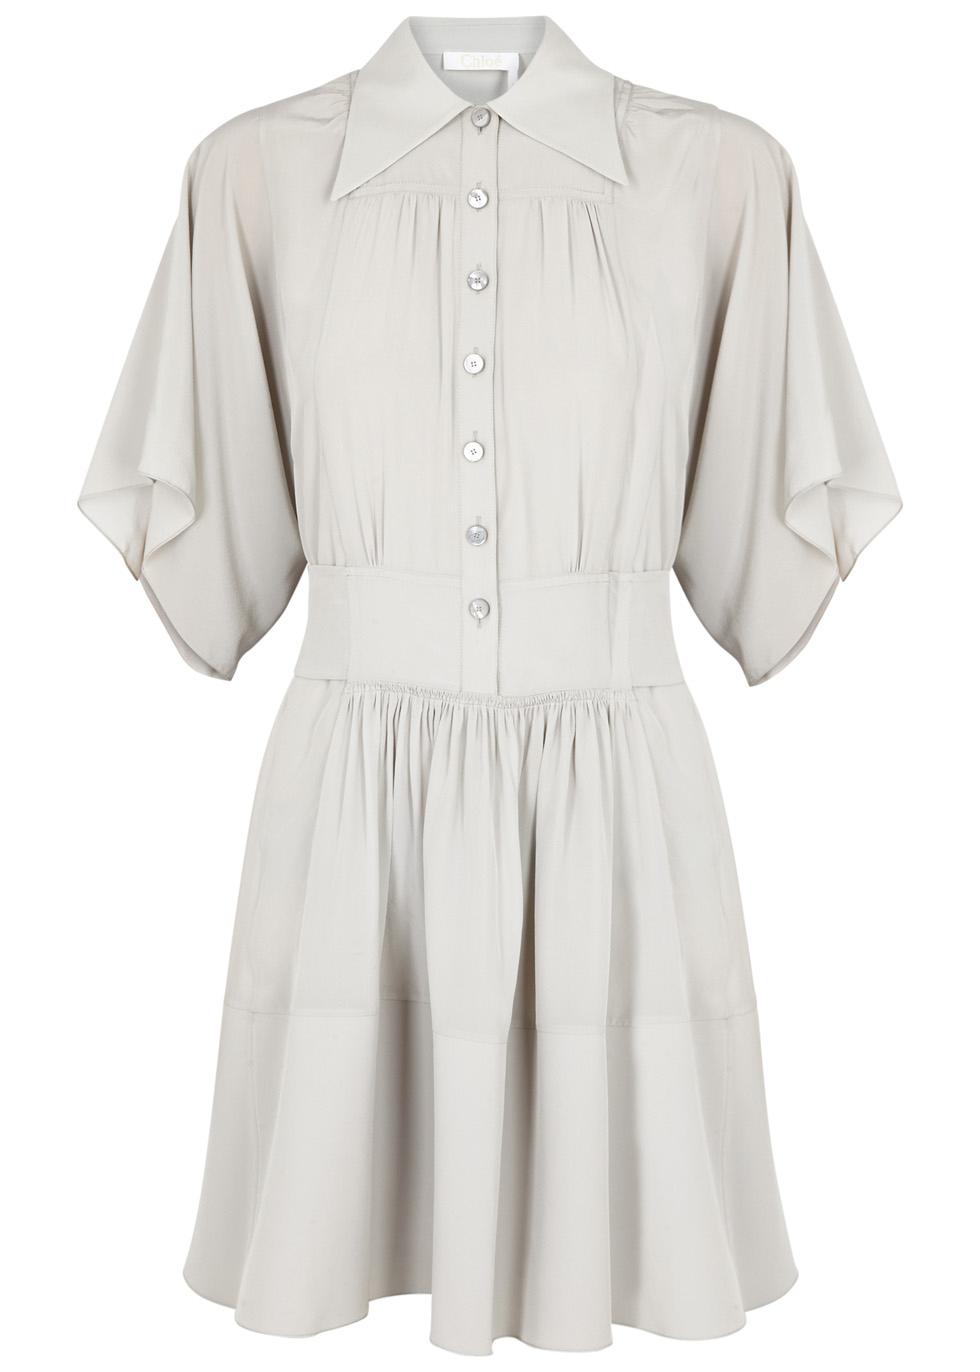 PALE GREY SILK DRESS